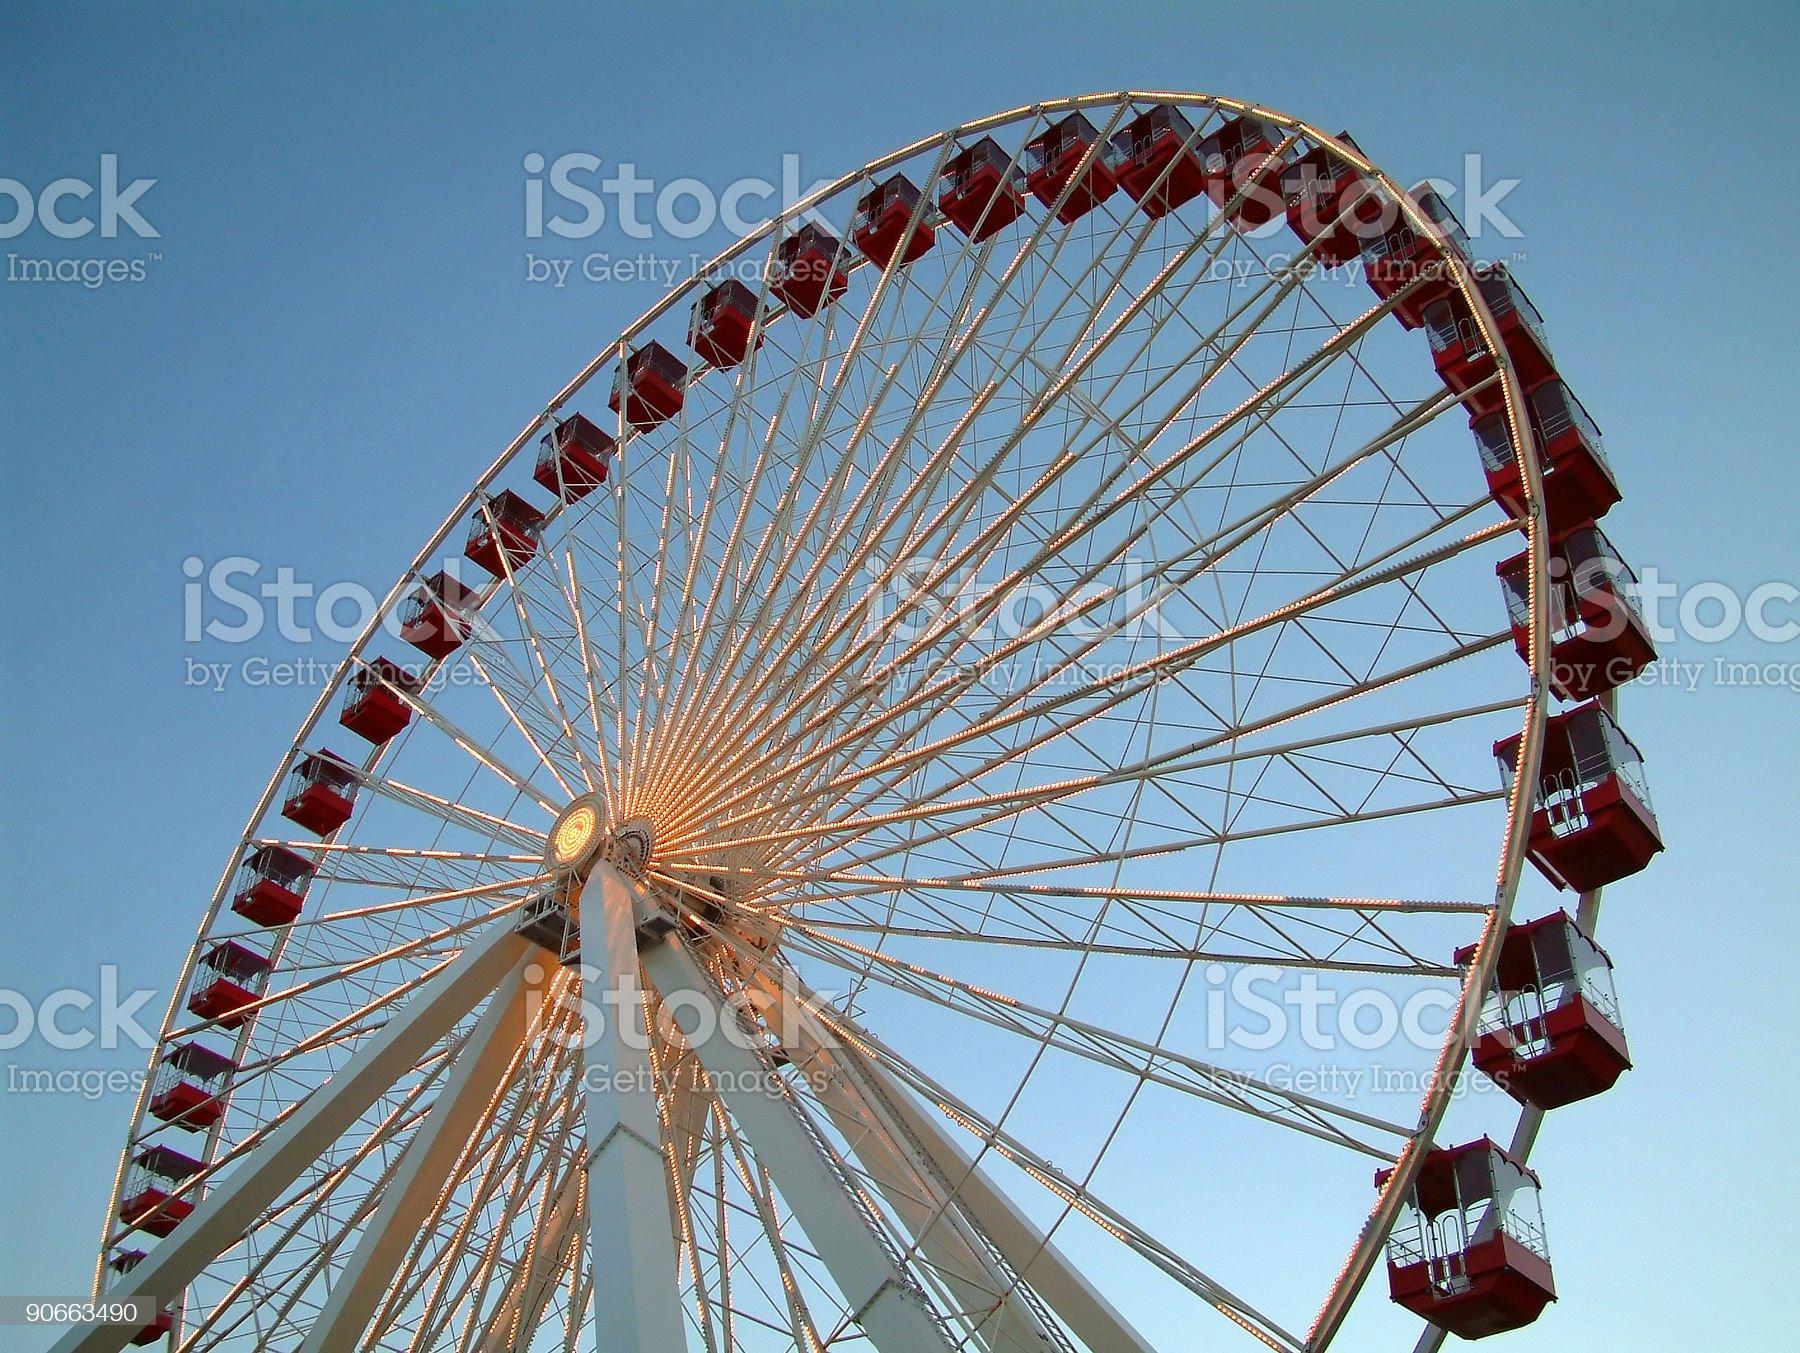 Objects - Ferris Wheel royalty-free stock photo